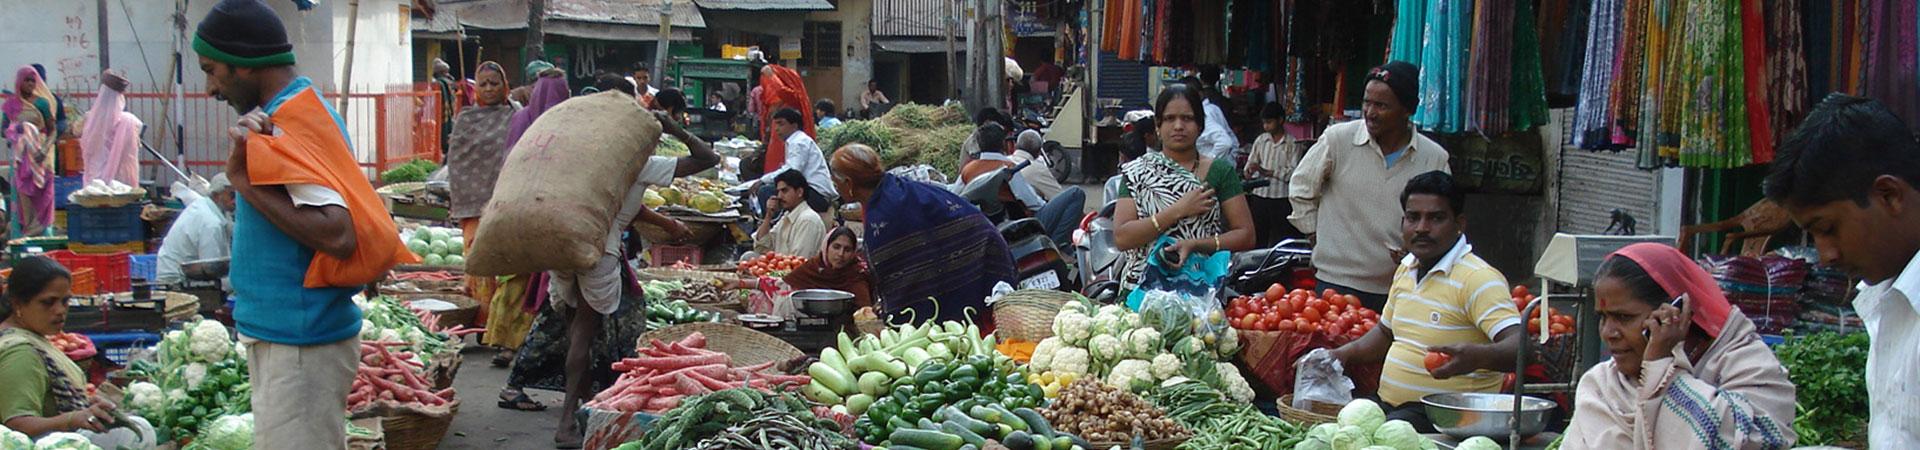 India Local Life Tour